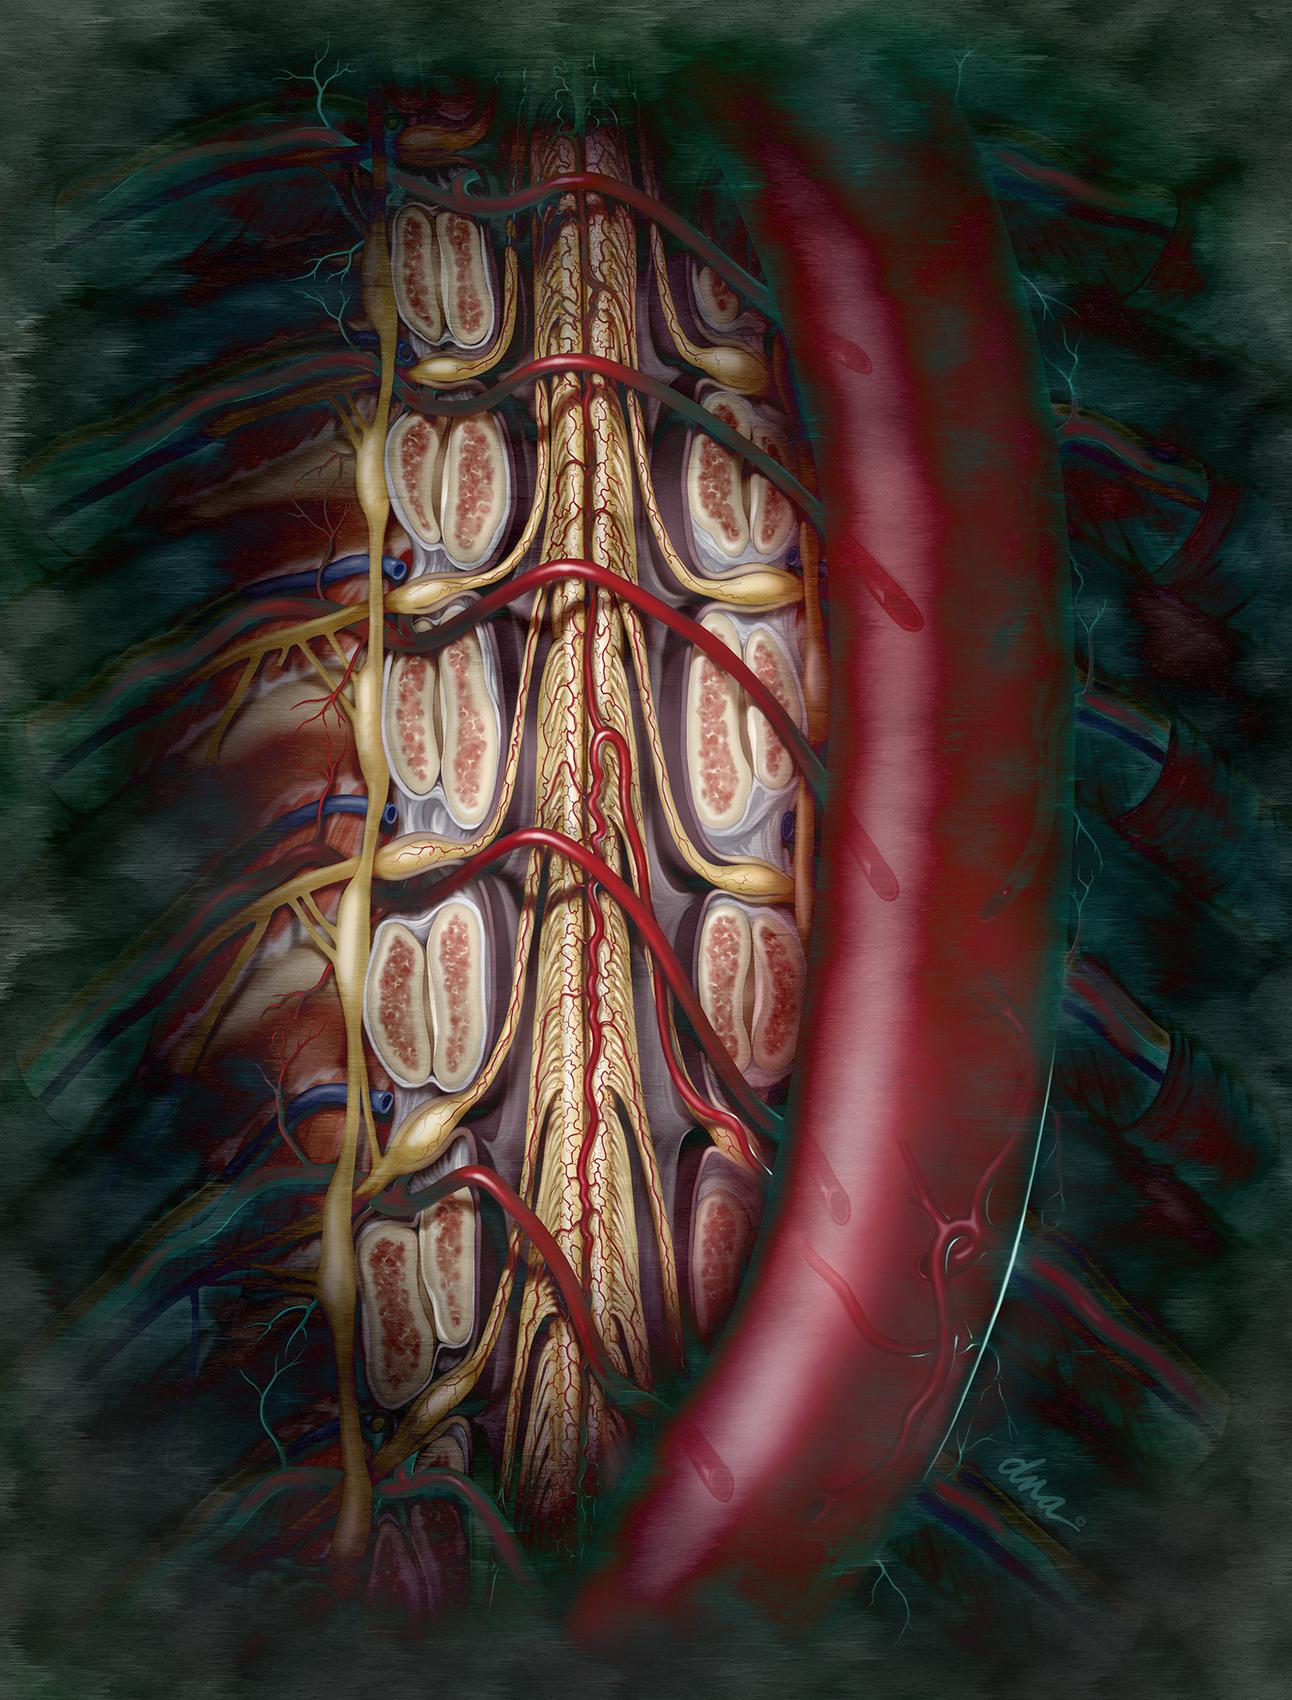 Spinal Artery